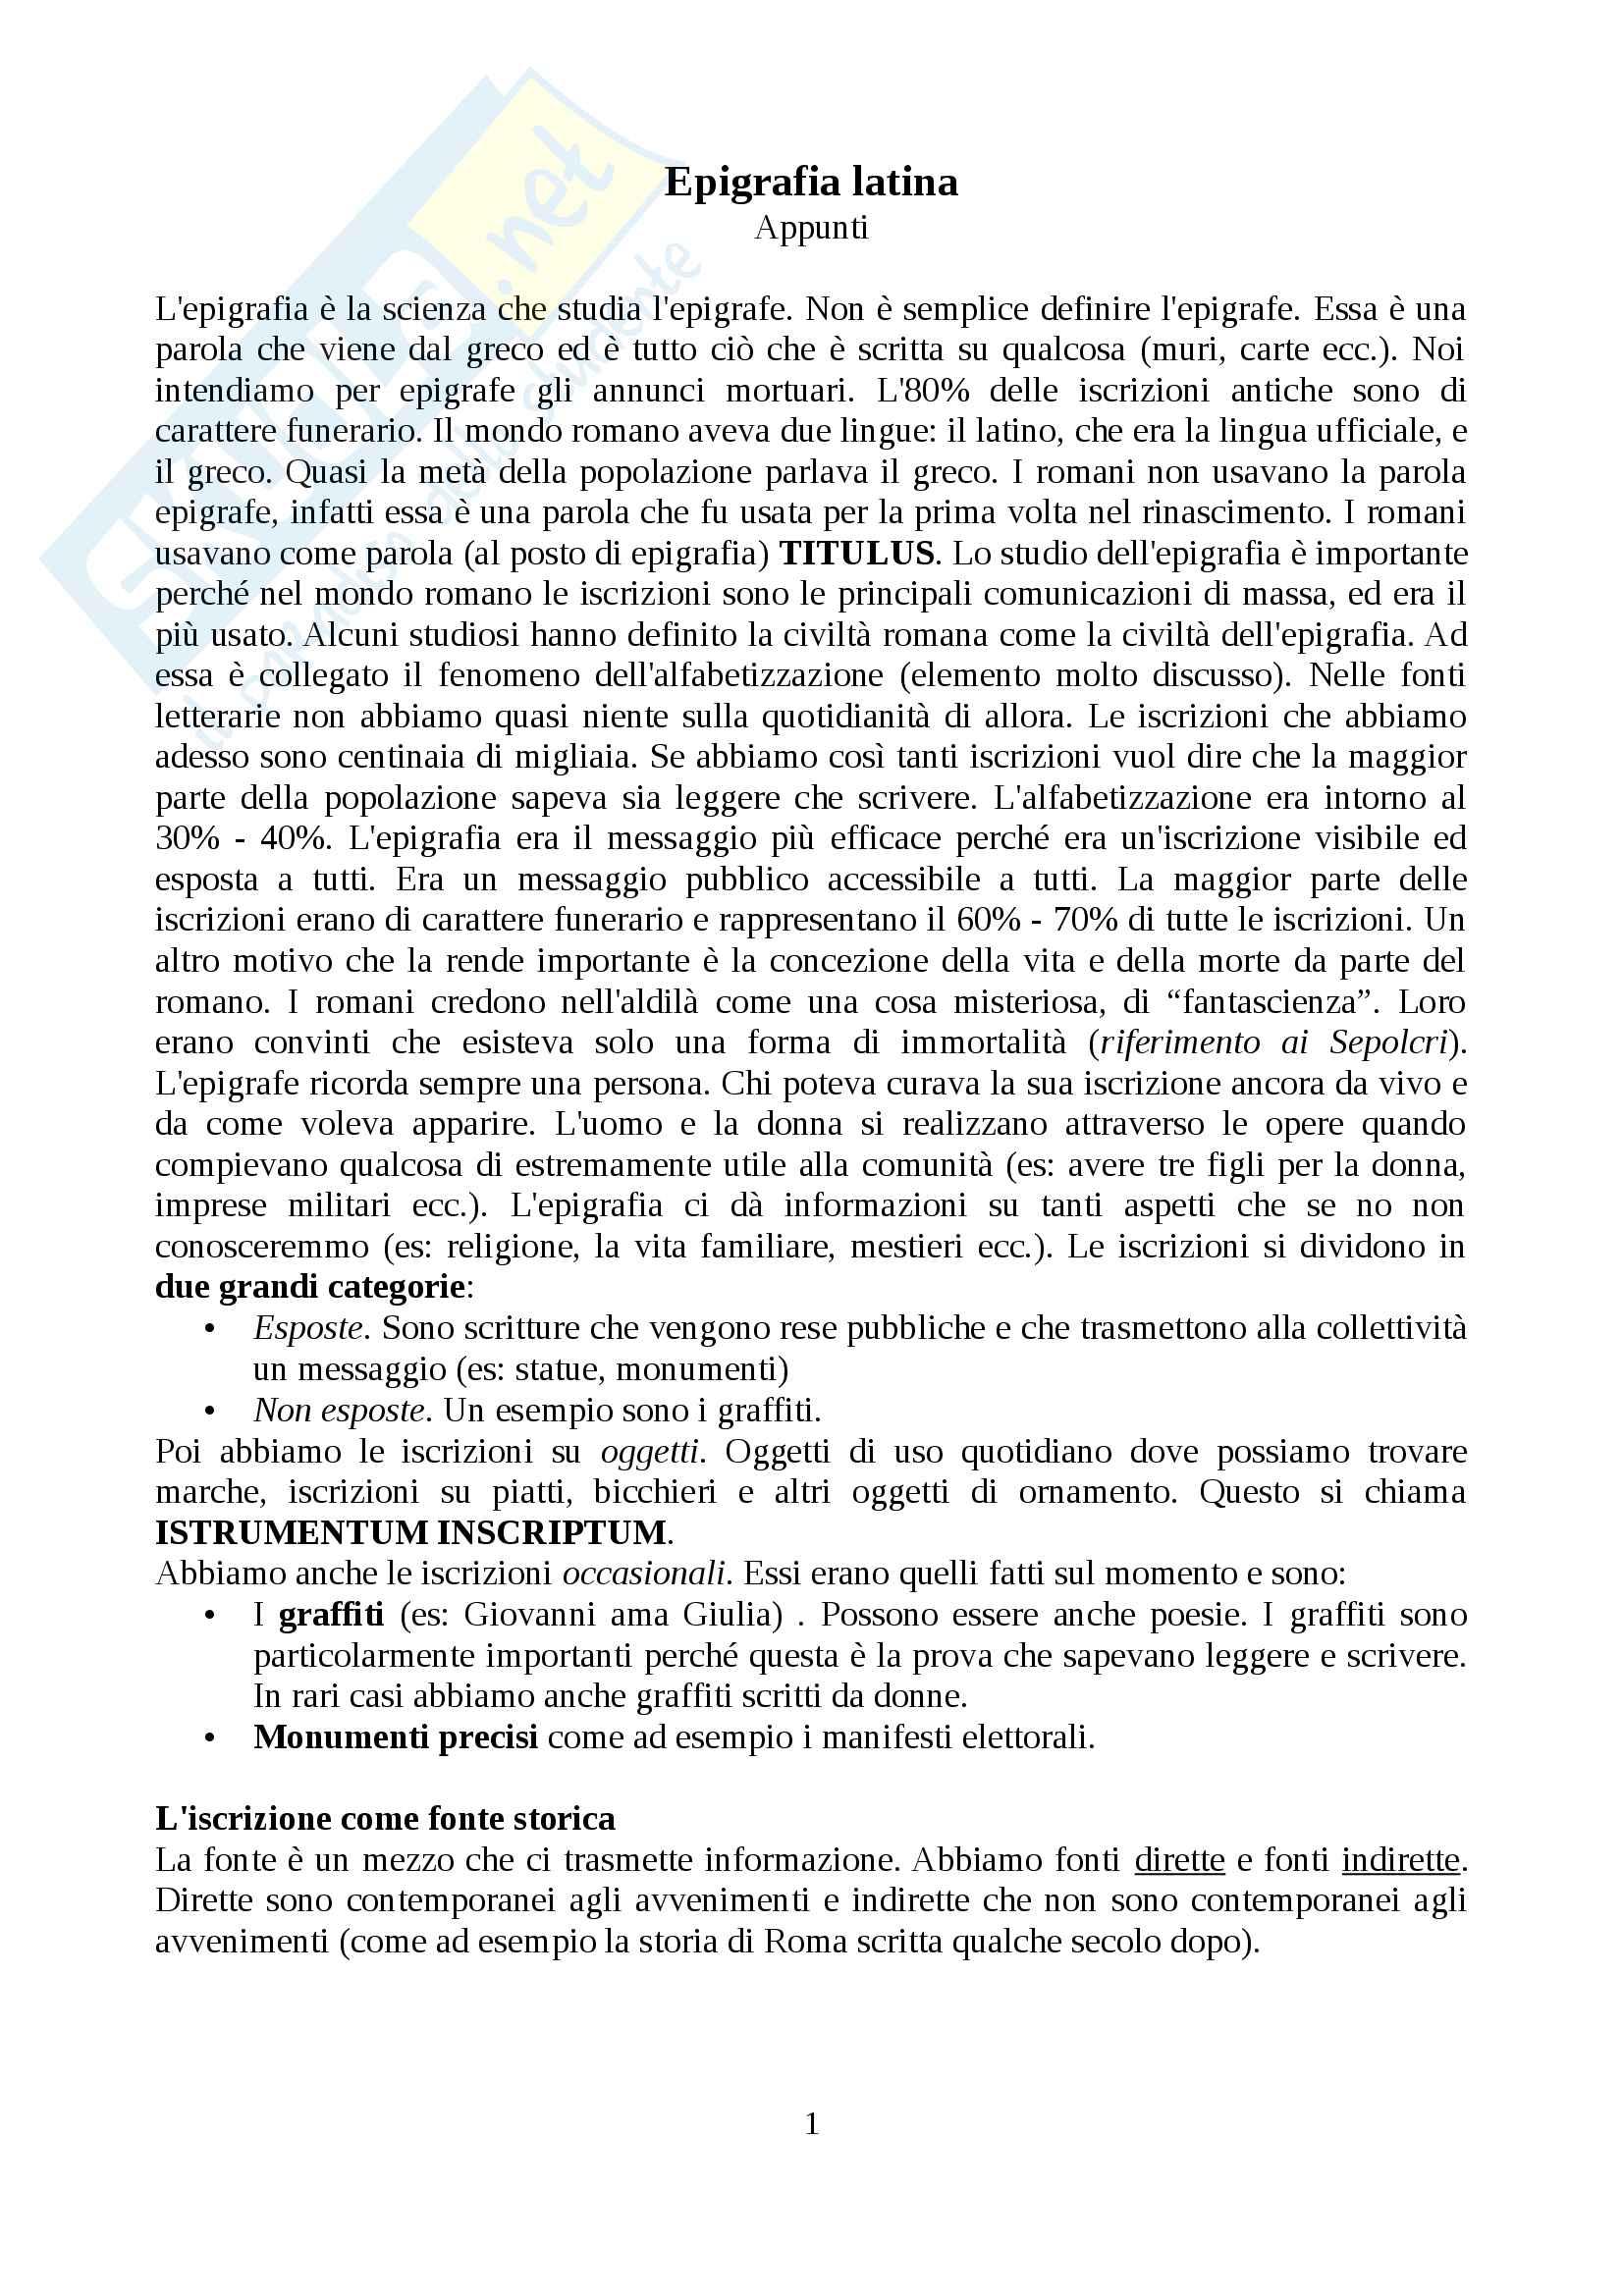 Epigrafia latina, prof. Buonopane